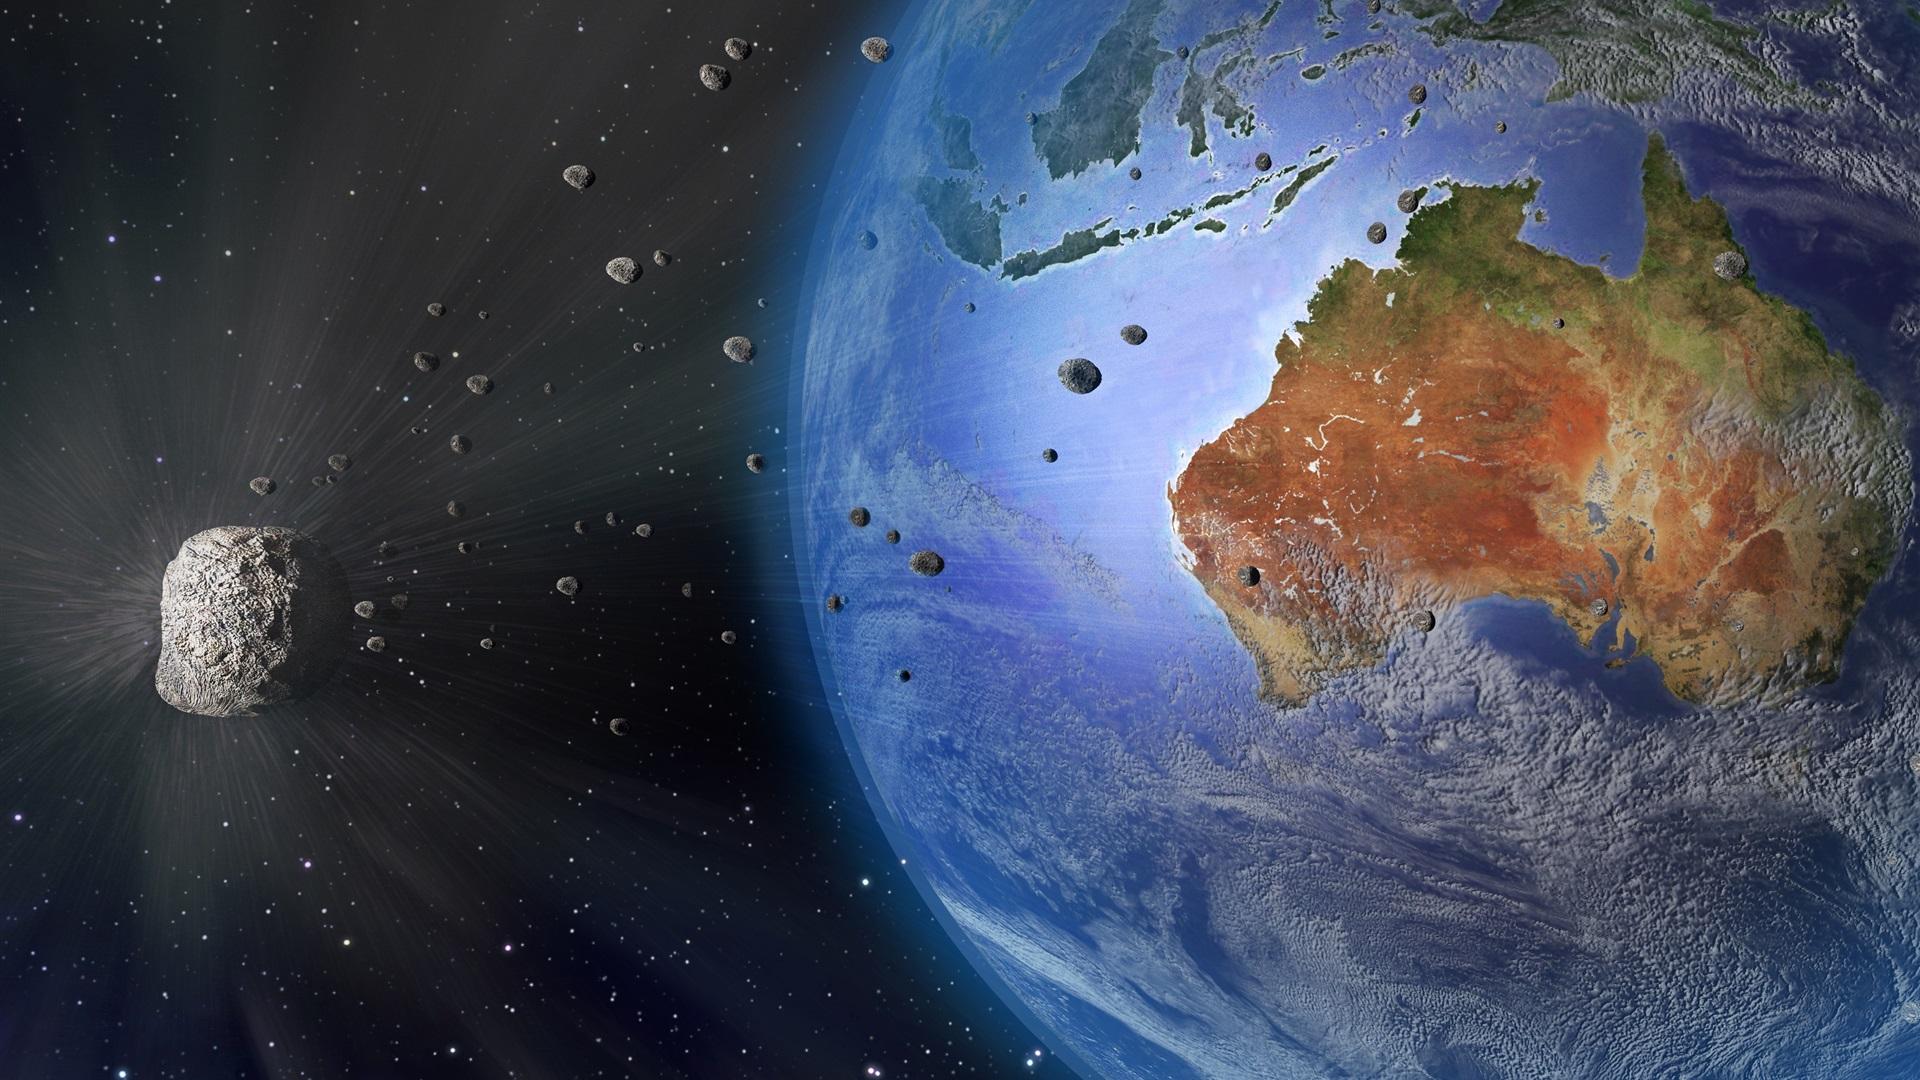 Wallpaper earth australia meteorite space 3840x2160 uhd - Space 4k phone wallpaper ...